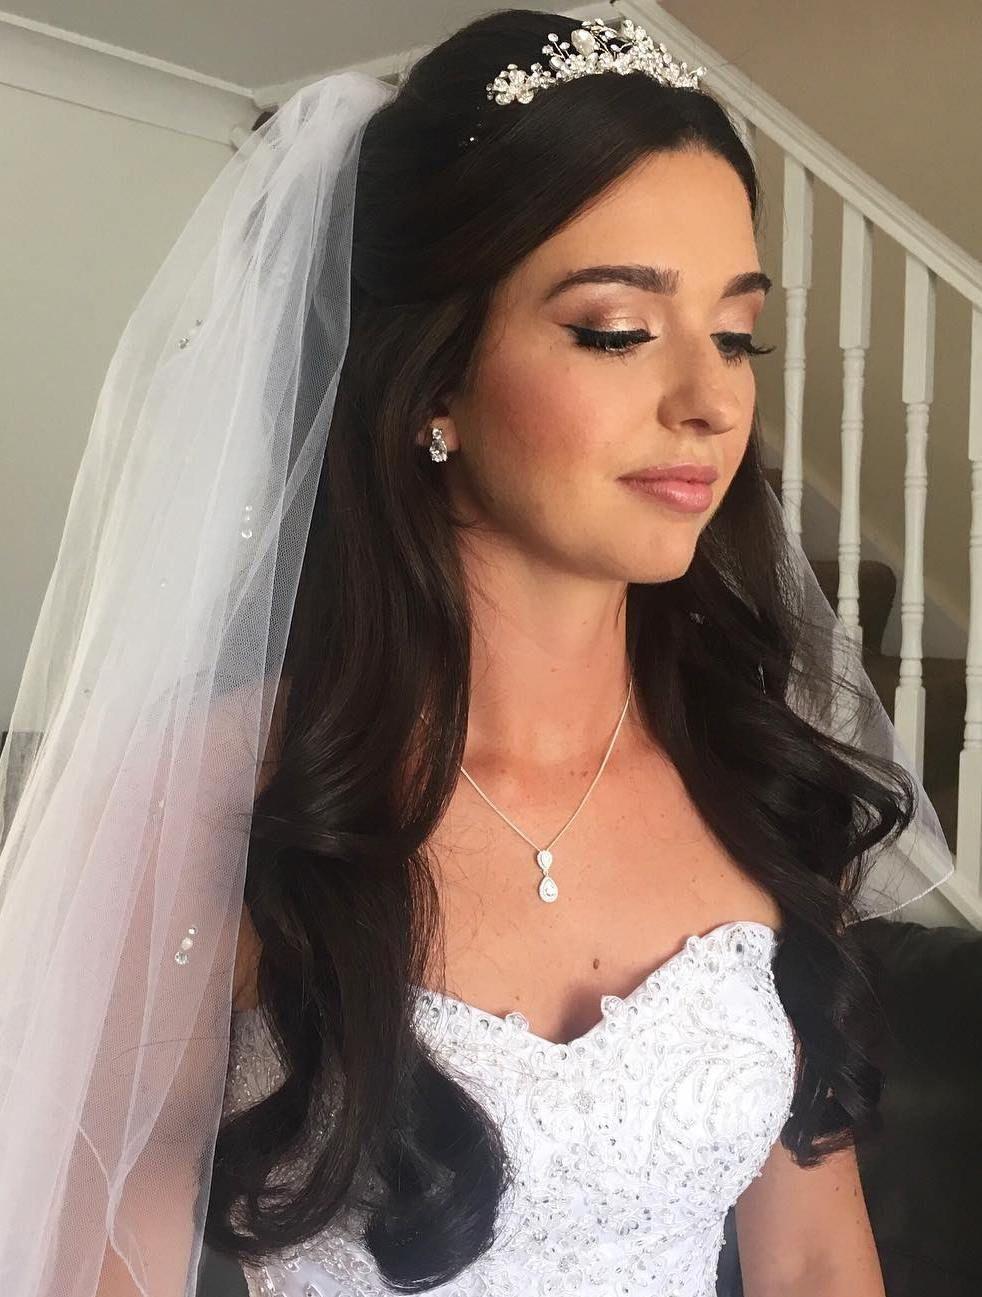 Half Up Half Down Wedding Hairstyles 50 Stylish Ideas For Brides Veil Hairstyles Veil Hair Down Wedding Hair Down